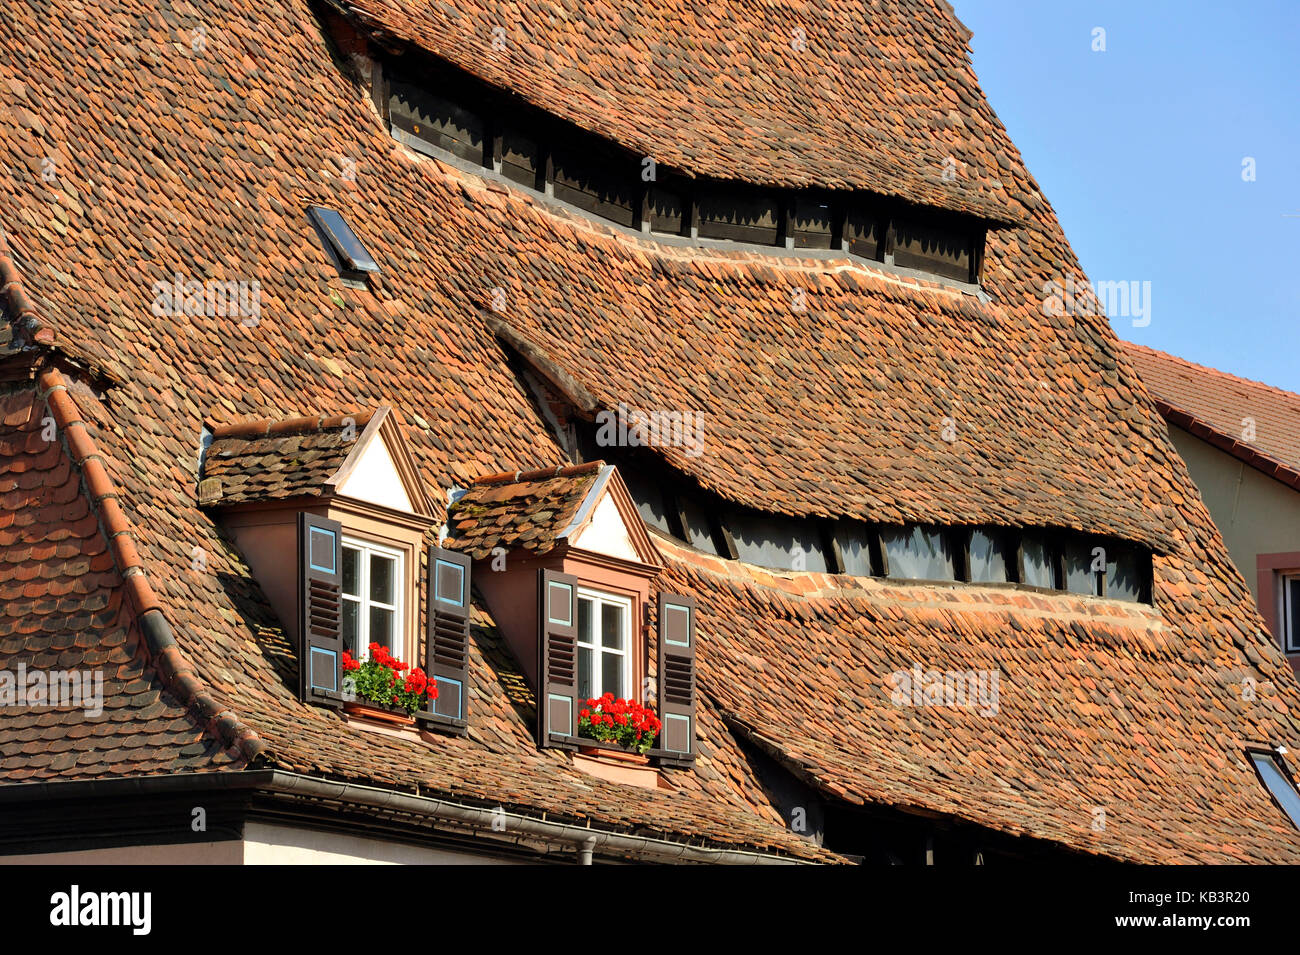 France, Bas Rhin, Wissembourg, Maison du sel (salt house) - Stock Image